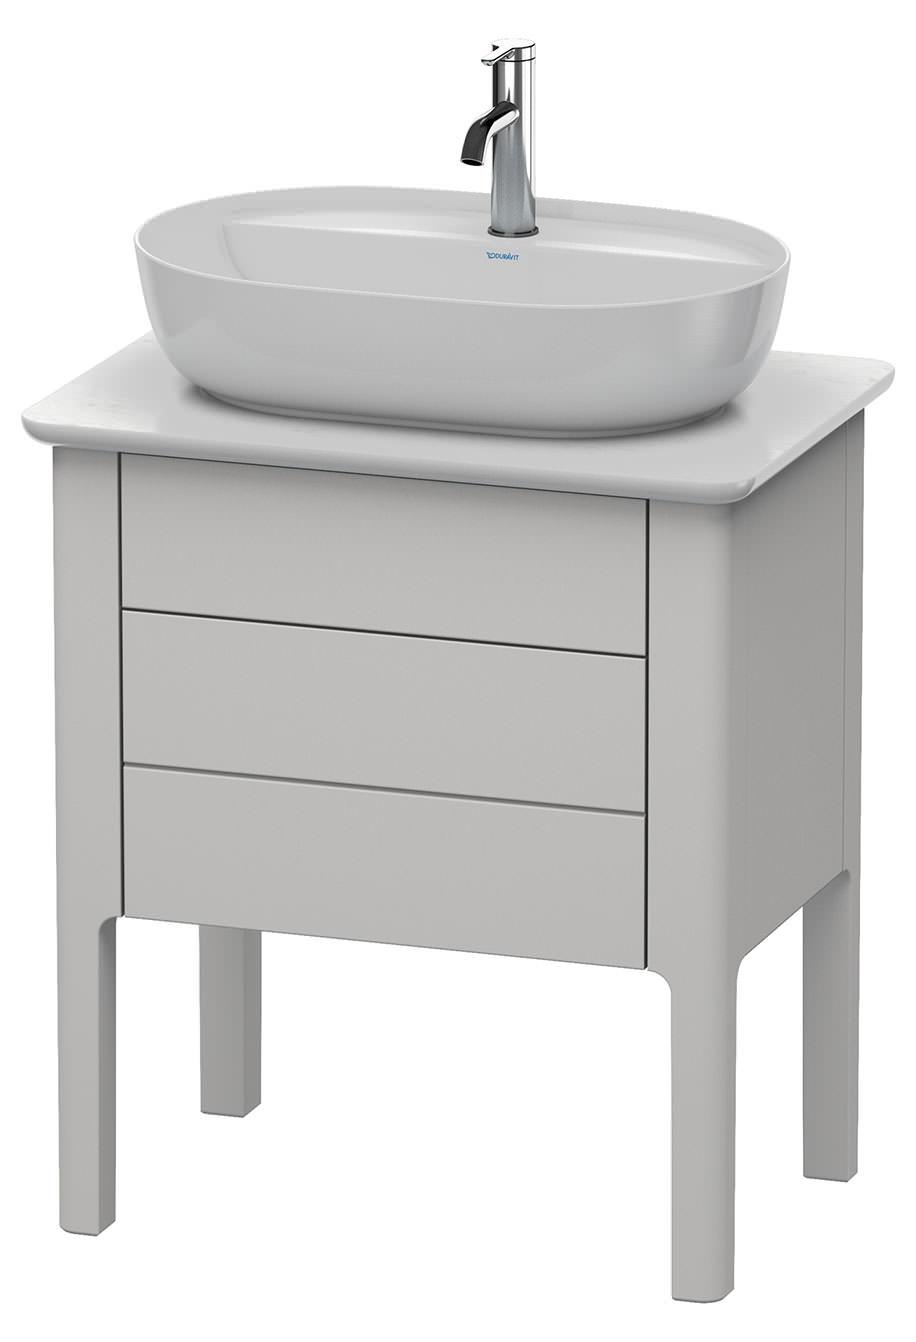 duravit luv 688 x 450mm floor standing vanity unit nordic. Black Bedroom Furniture Sets. Home Design Ideas